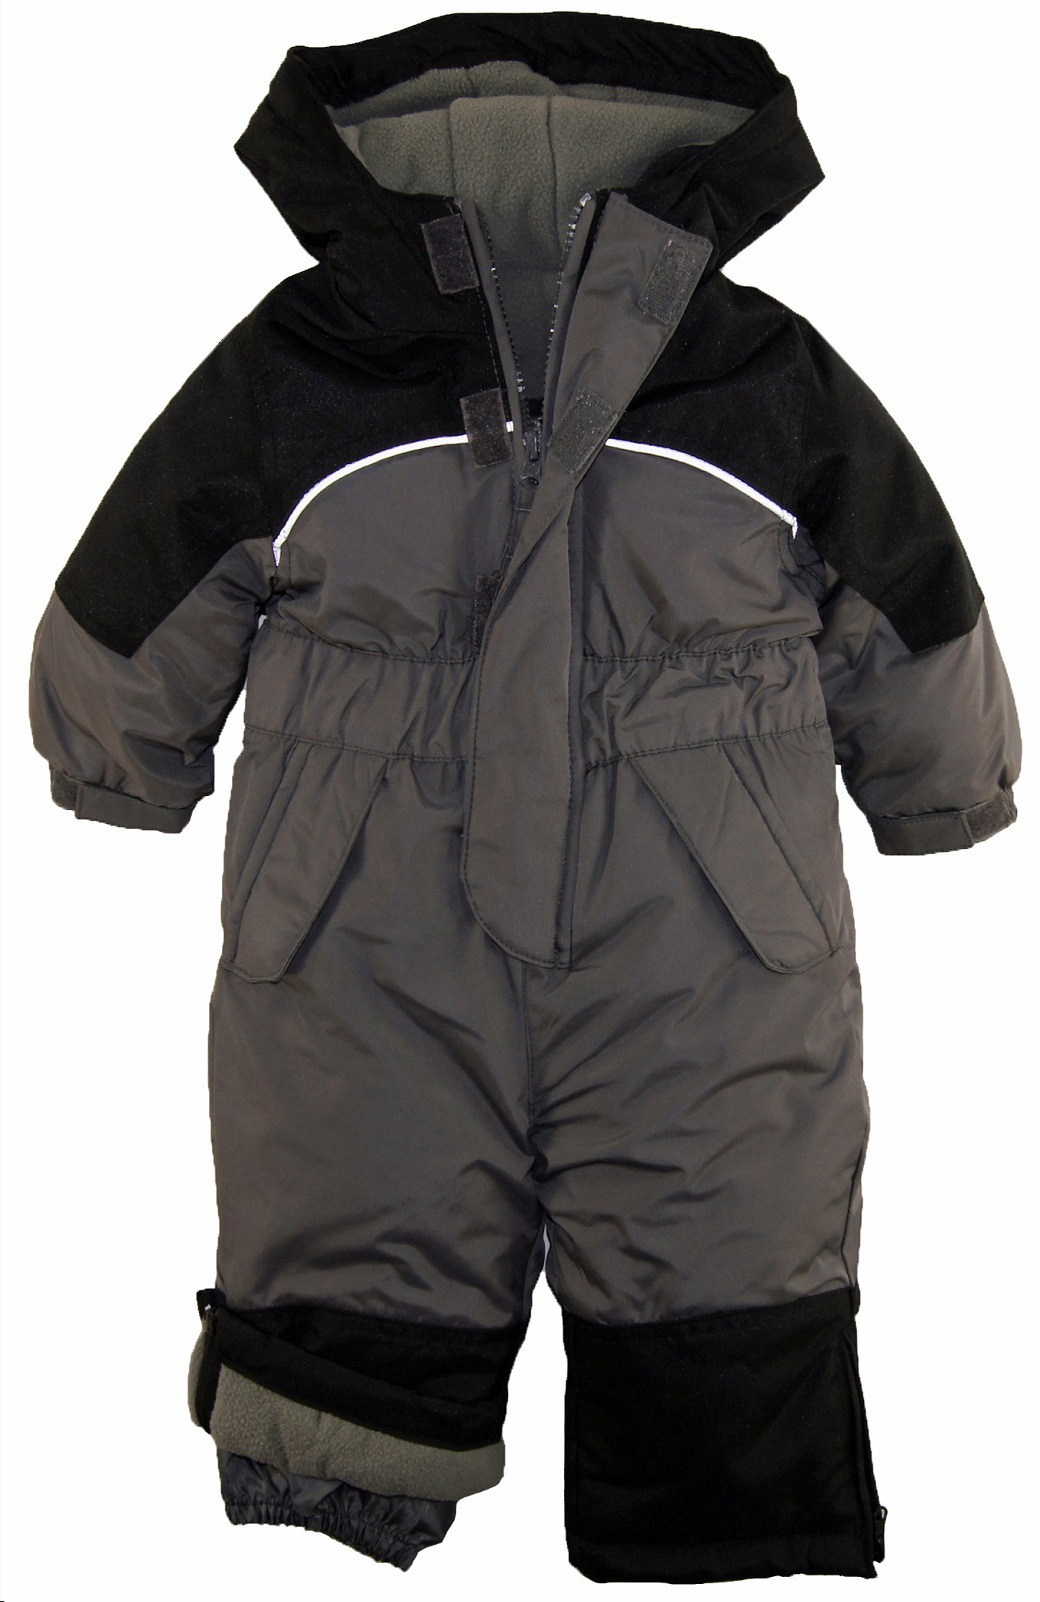 95f43d3f72d8 iXtreme - Baby Toddler Boy Ski Snowboard Full Body Snowsuit ...